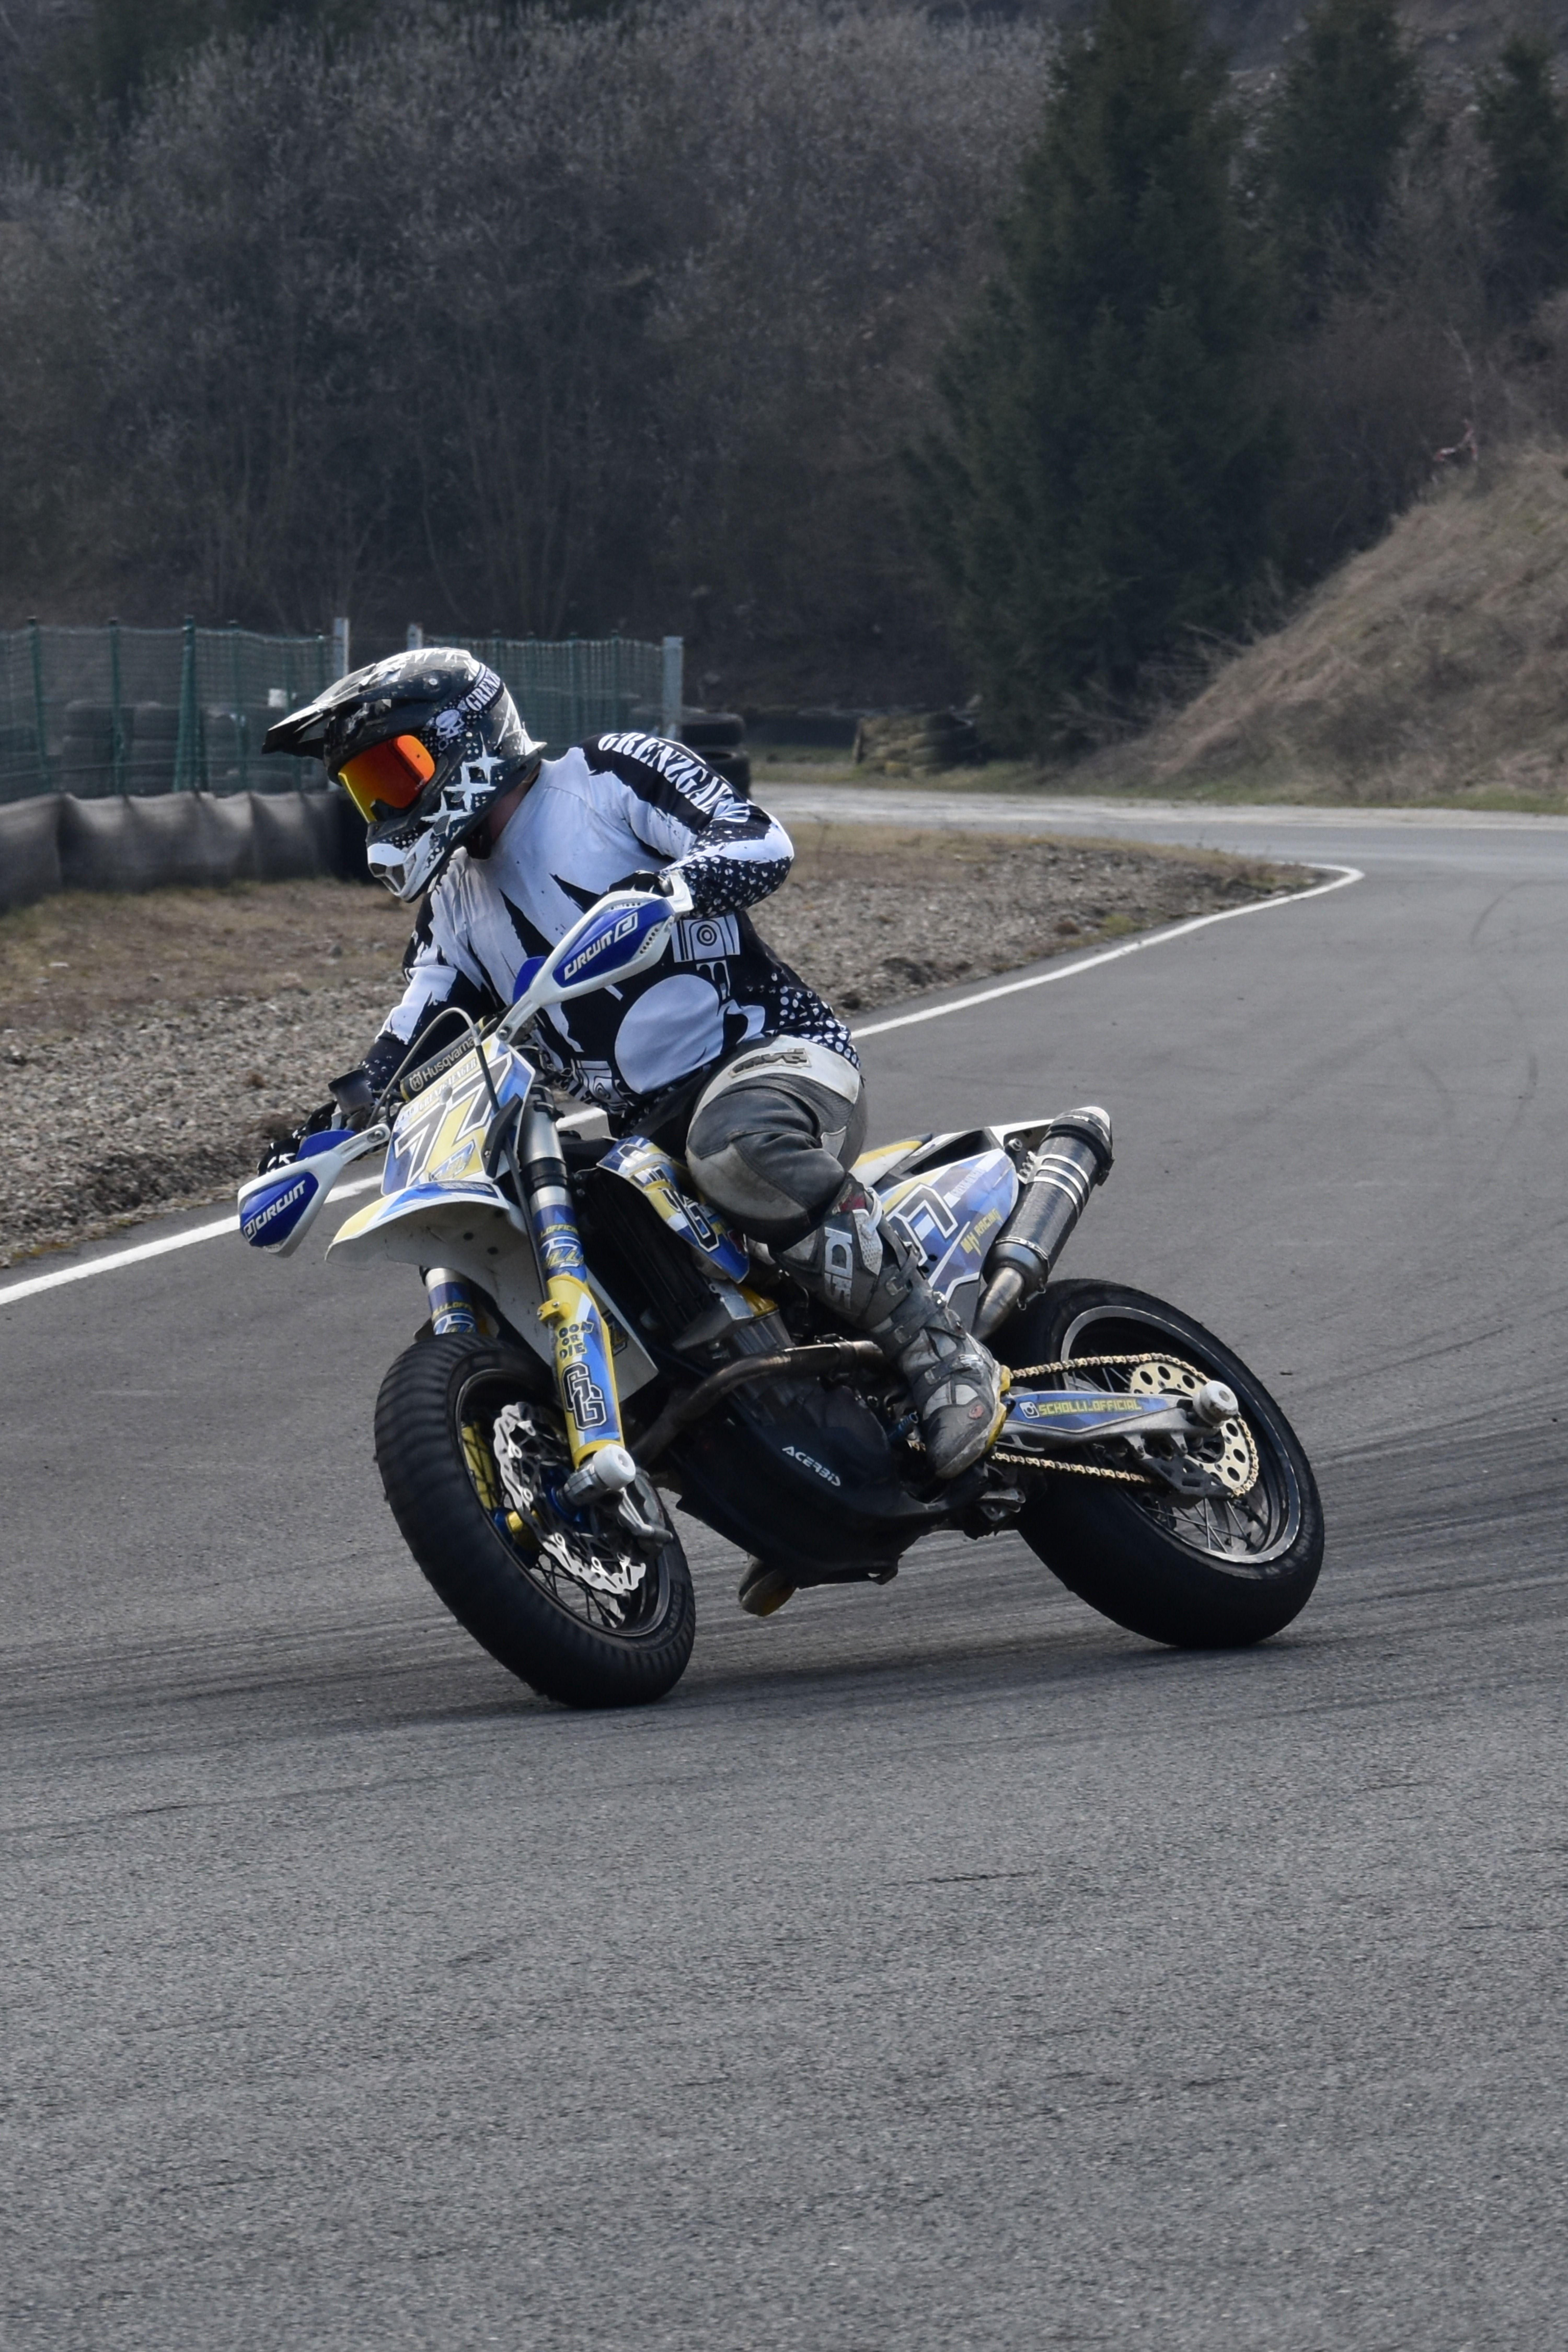 Grenzgaenger Racetrack Wheelie Ride Supermoto Adrenaline